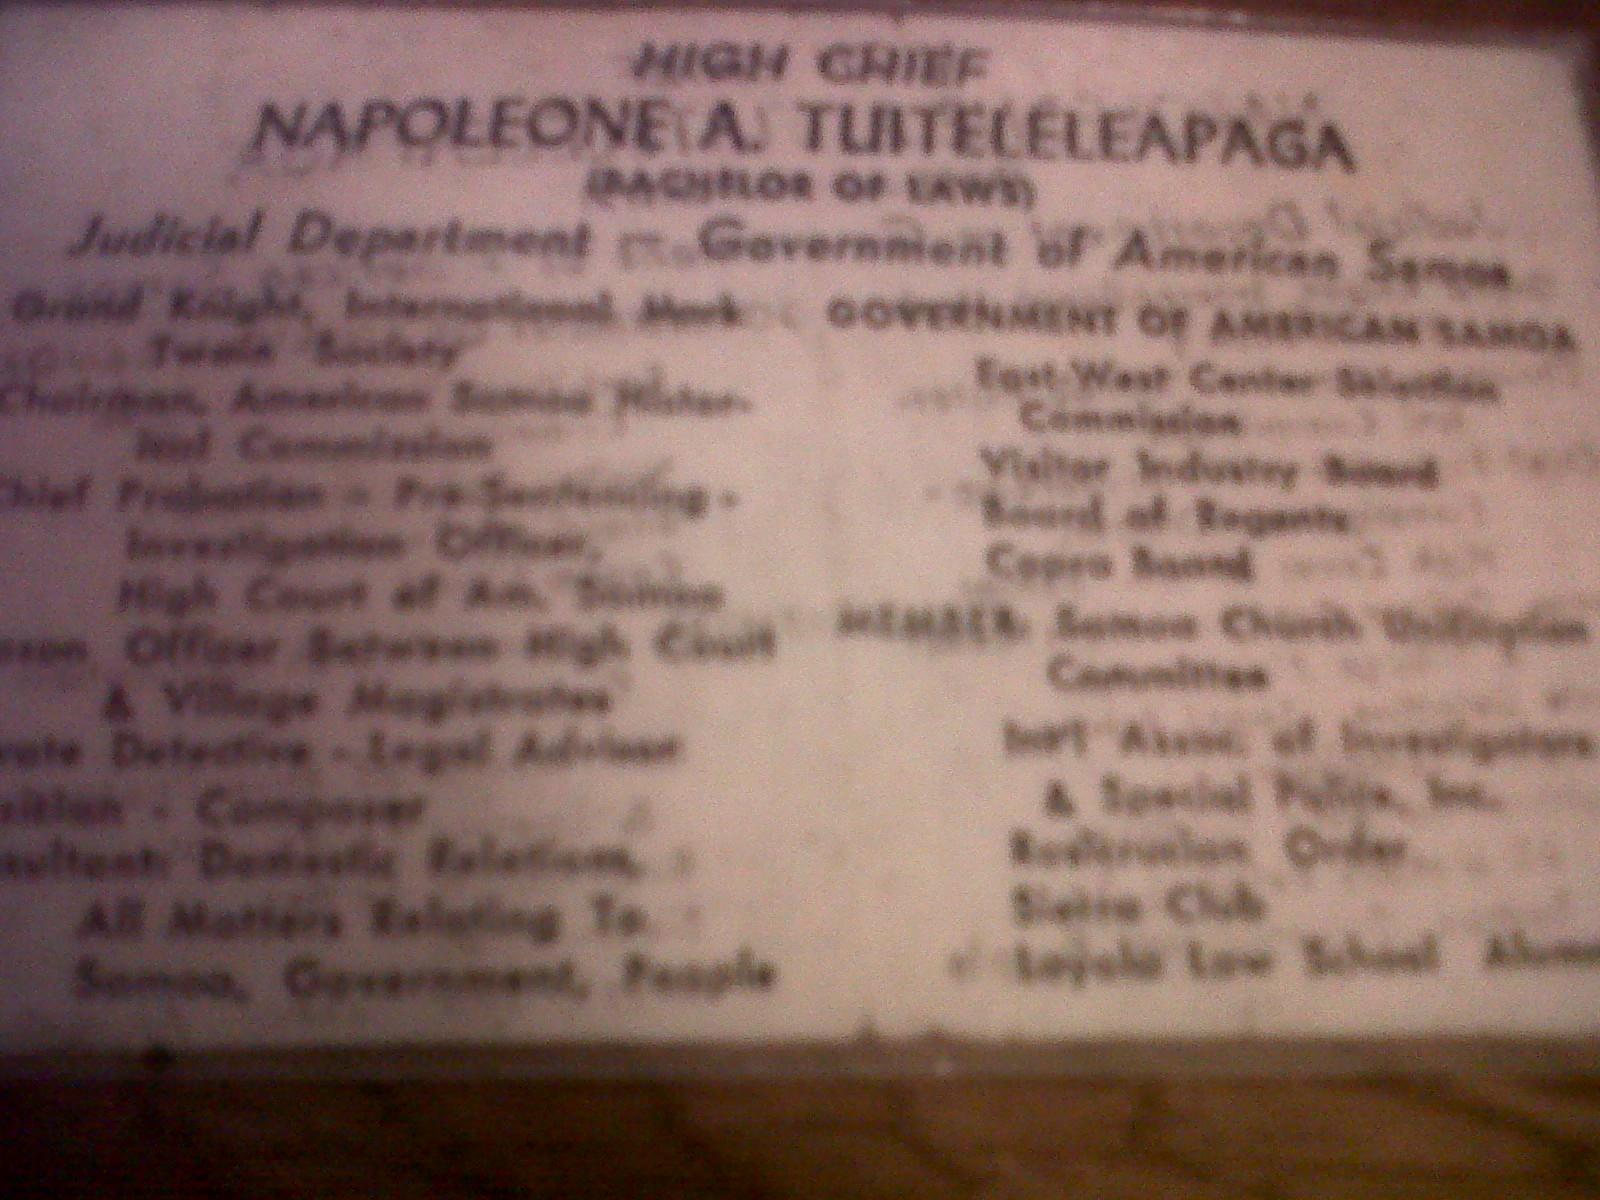 Napoleon Andrew Tuiteleleapaga